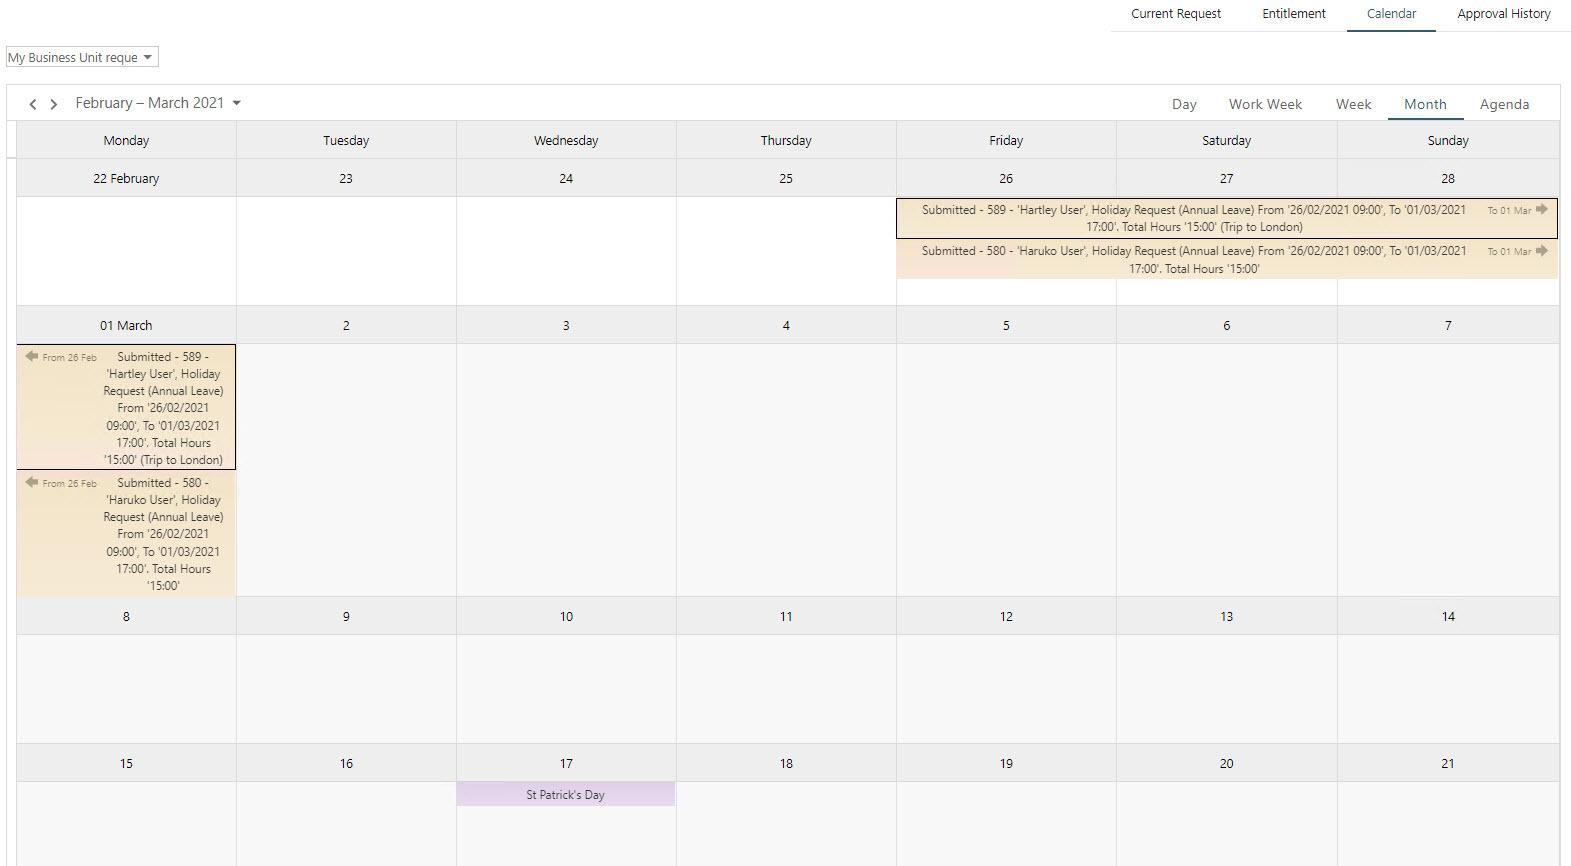 Sicon WAP Holidays Help and User Guide - WAP Holidays HUG Section 11.3 - Image 1